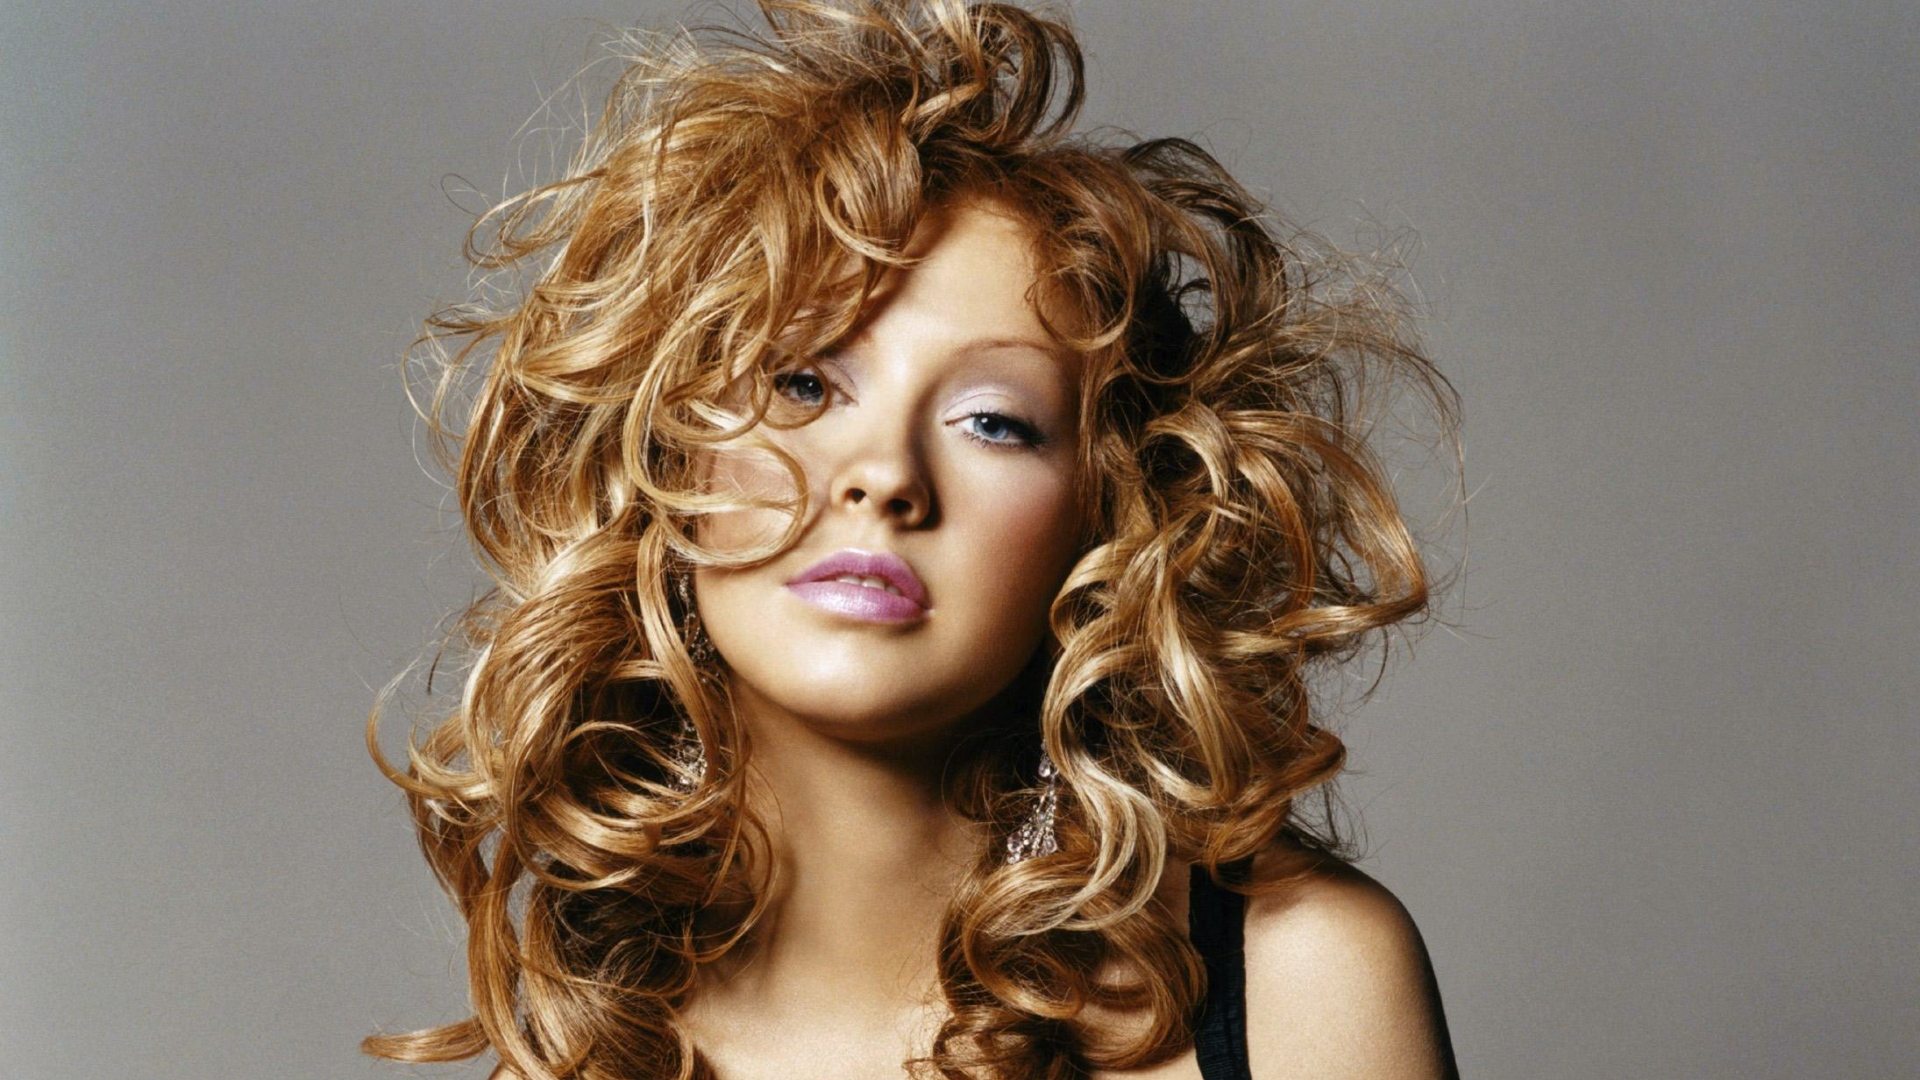 Hair Style Wallpaper Stylish Parmish Verma Hairstyle Hd Wallpaper